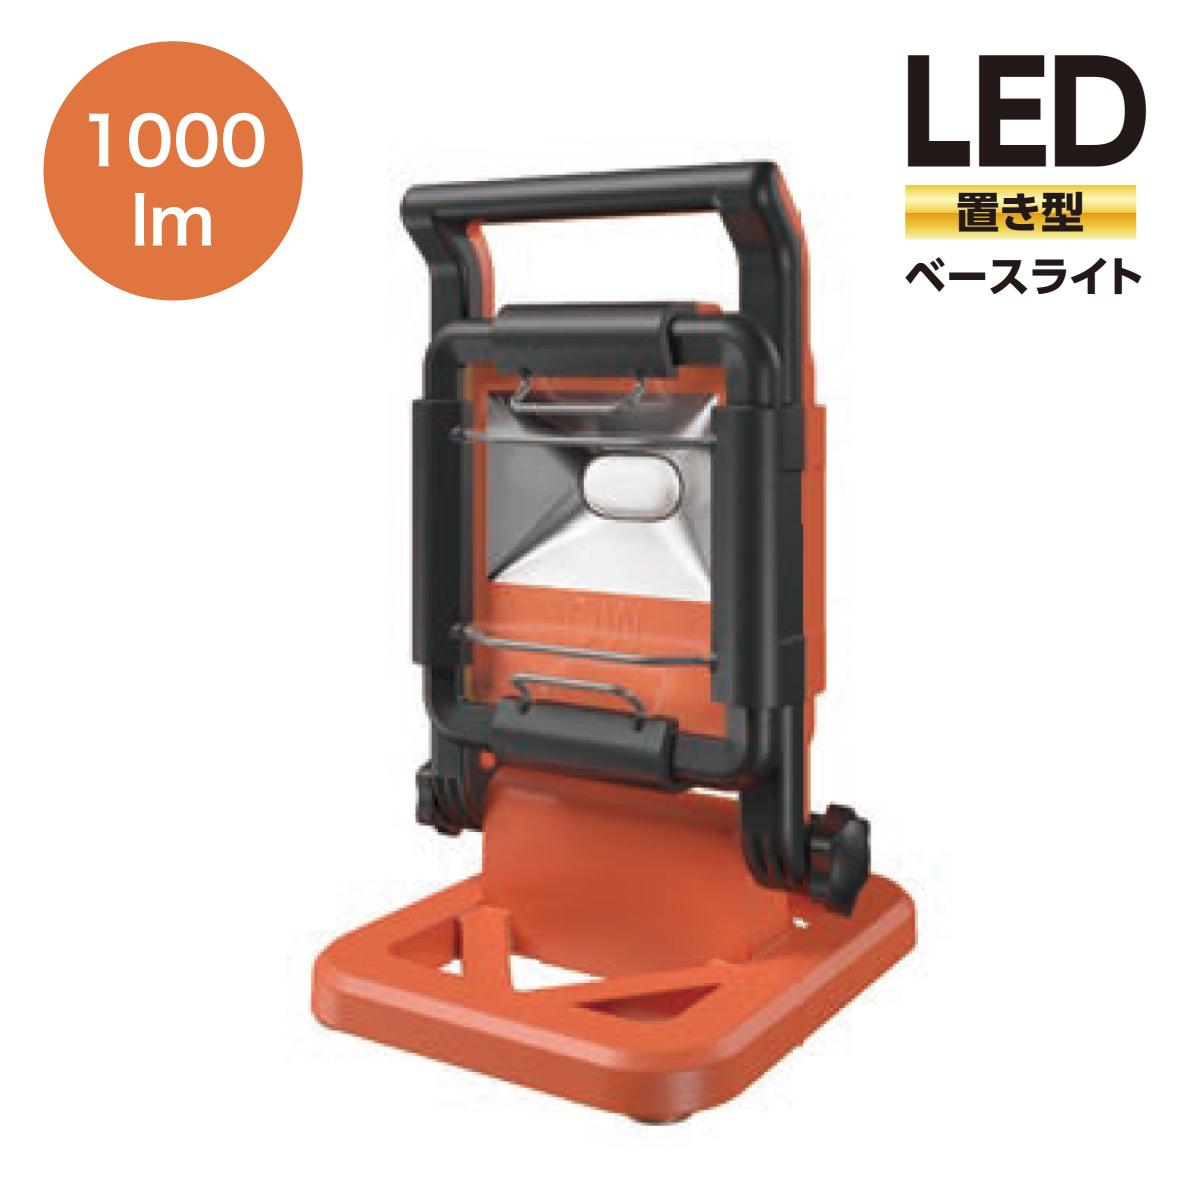 LEDベースライト 当店限定販売 ワークライト 照明 省電力 長寿命 防水 LWT-1000BA ライト LEDスタンドライト 防塵 ランキング総合1位 1000lm ブルズLEDワークライトシリーズ